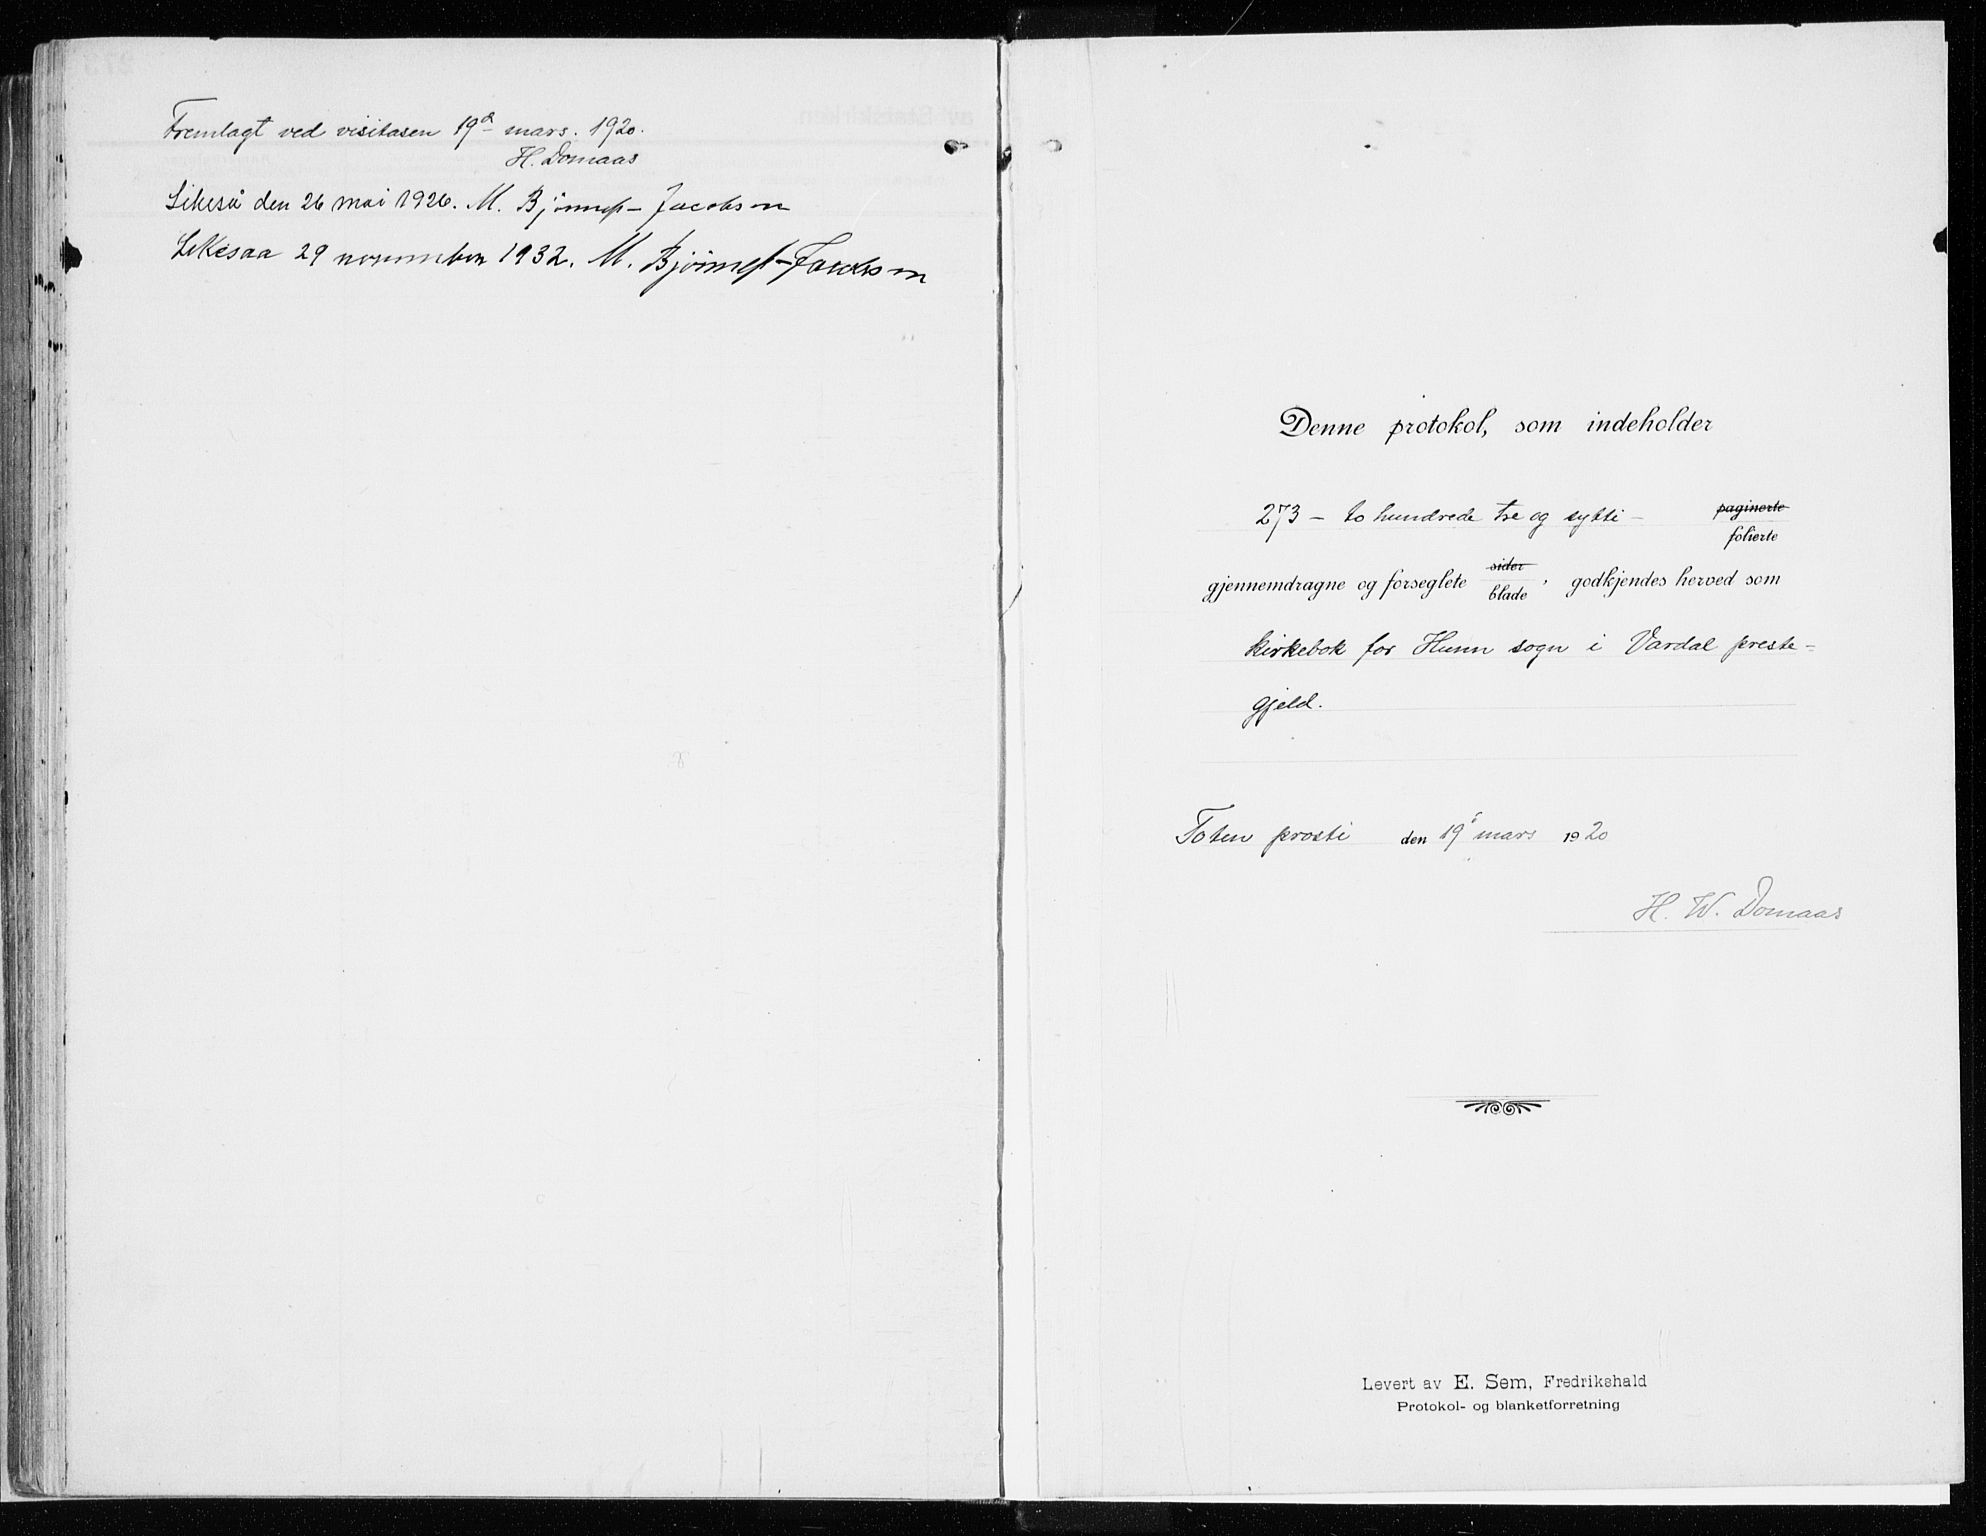 SAH, Vardal prestekontor, H/Ha/Haa/L0017: Ministerialbok nr. 17, 1915-1929